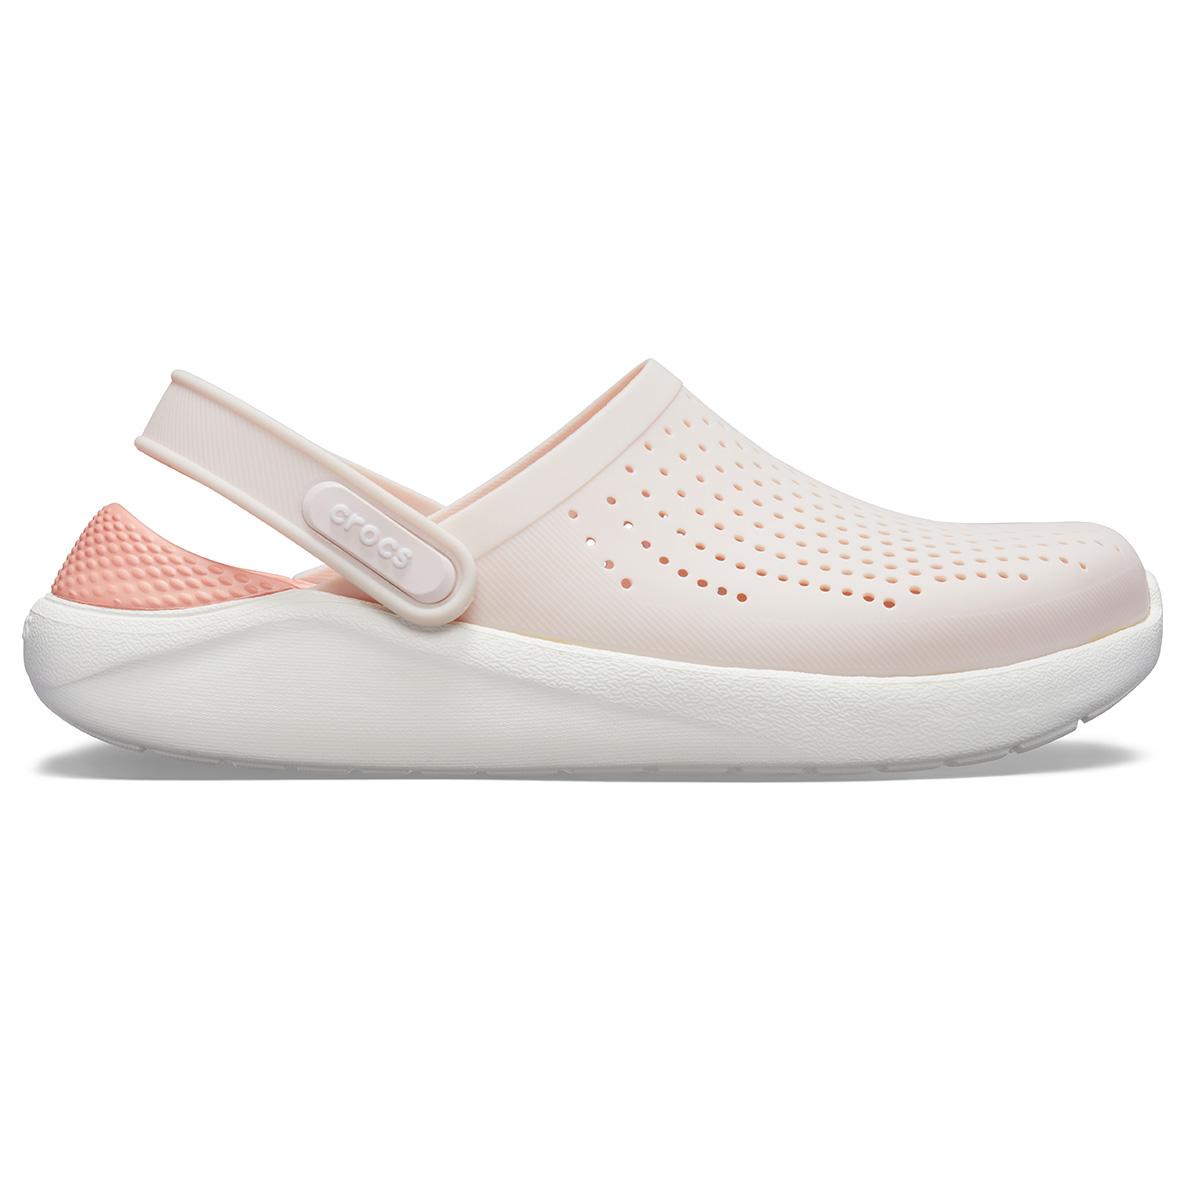 Crocs LiteRide Clog - Açık Pembe/Beyaz